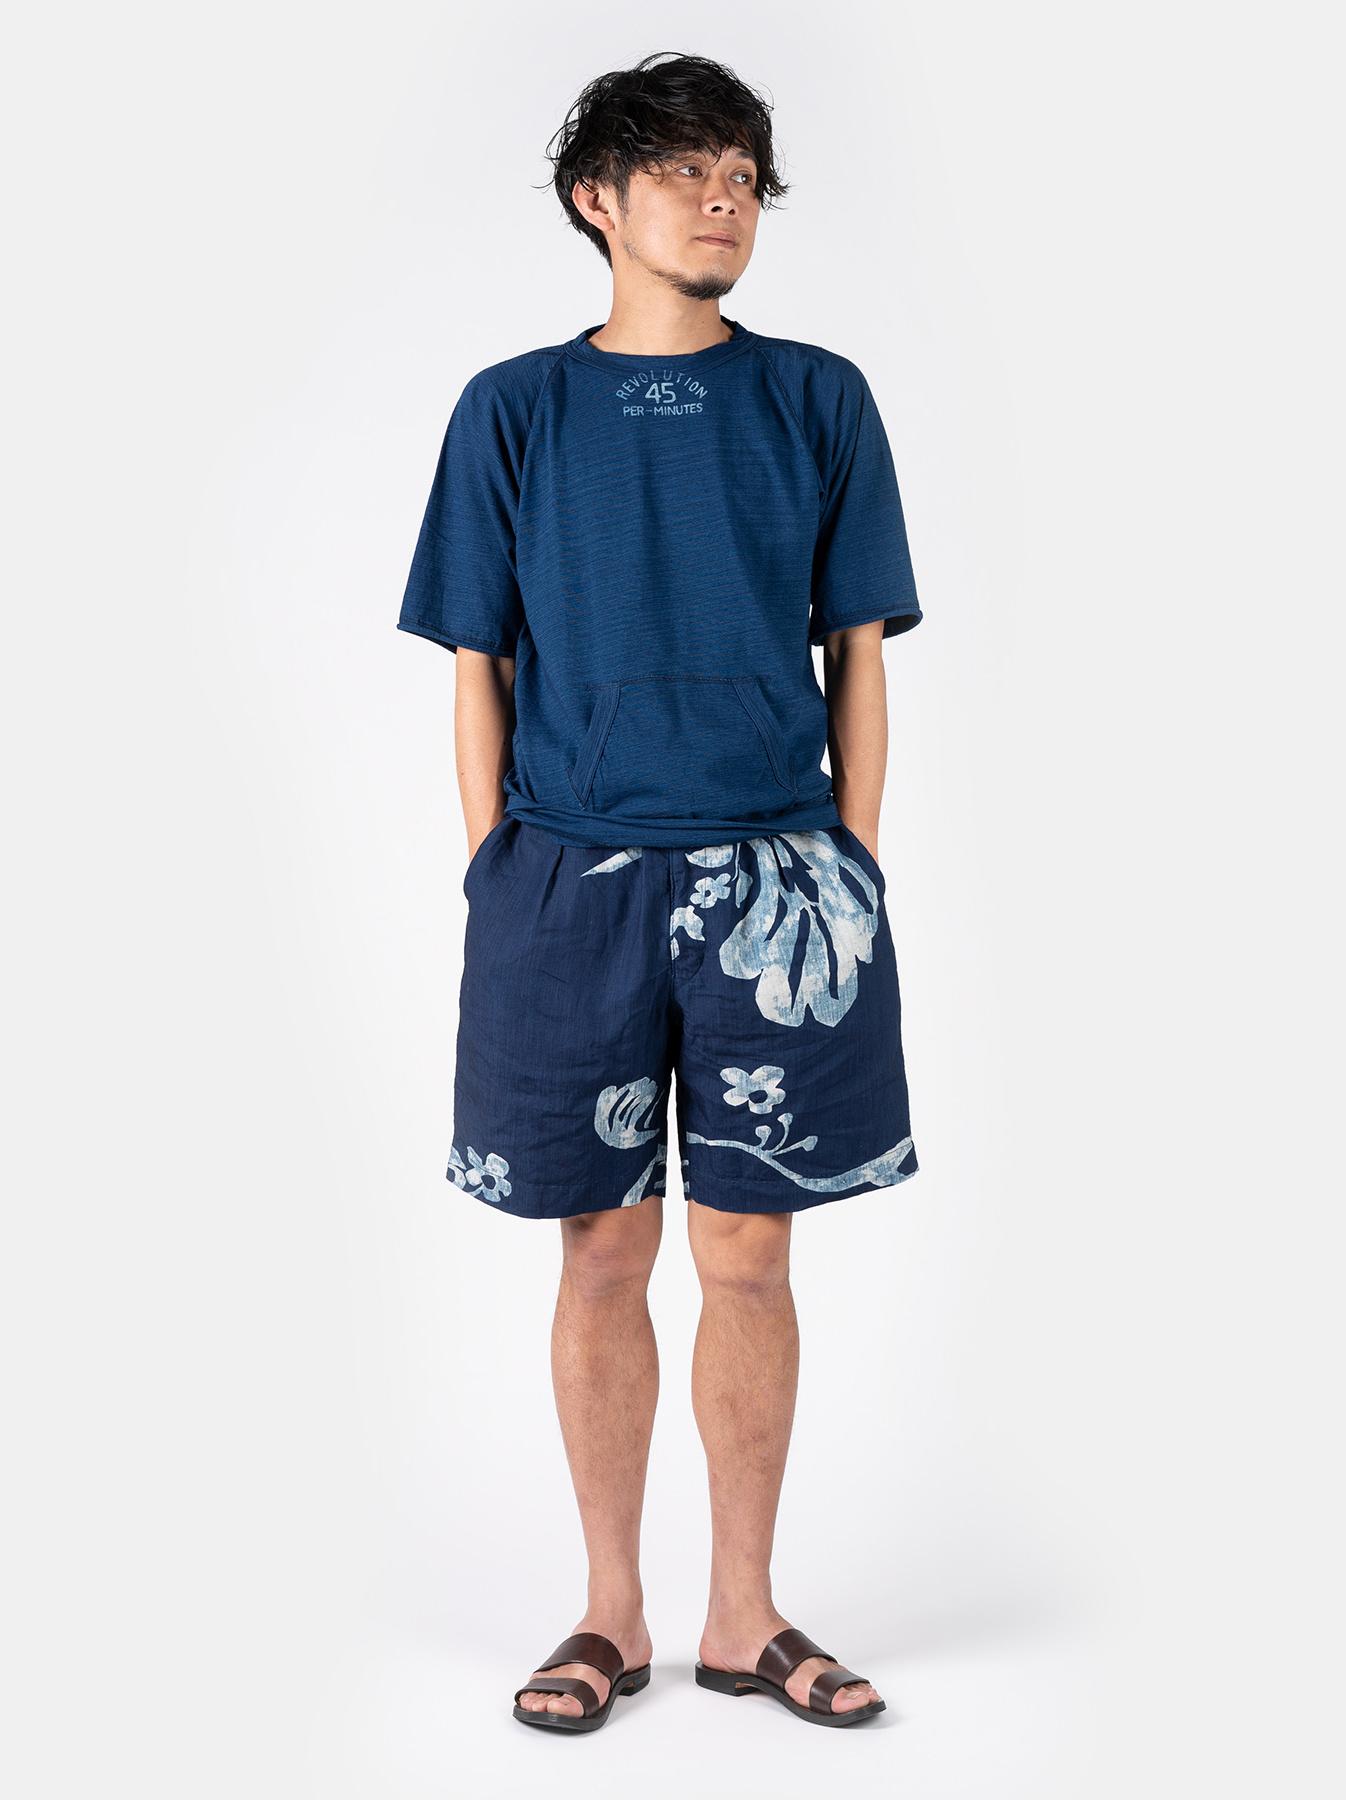 WH Indigo Linen Umiiloha 908 Short Pants-2